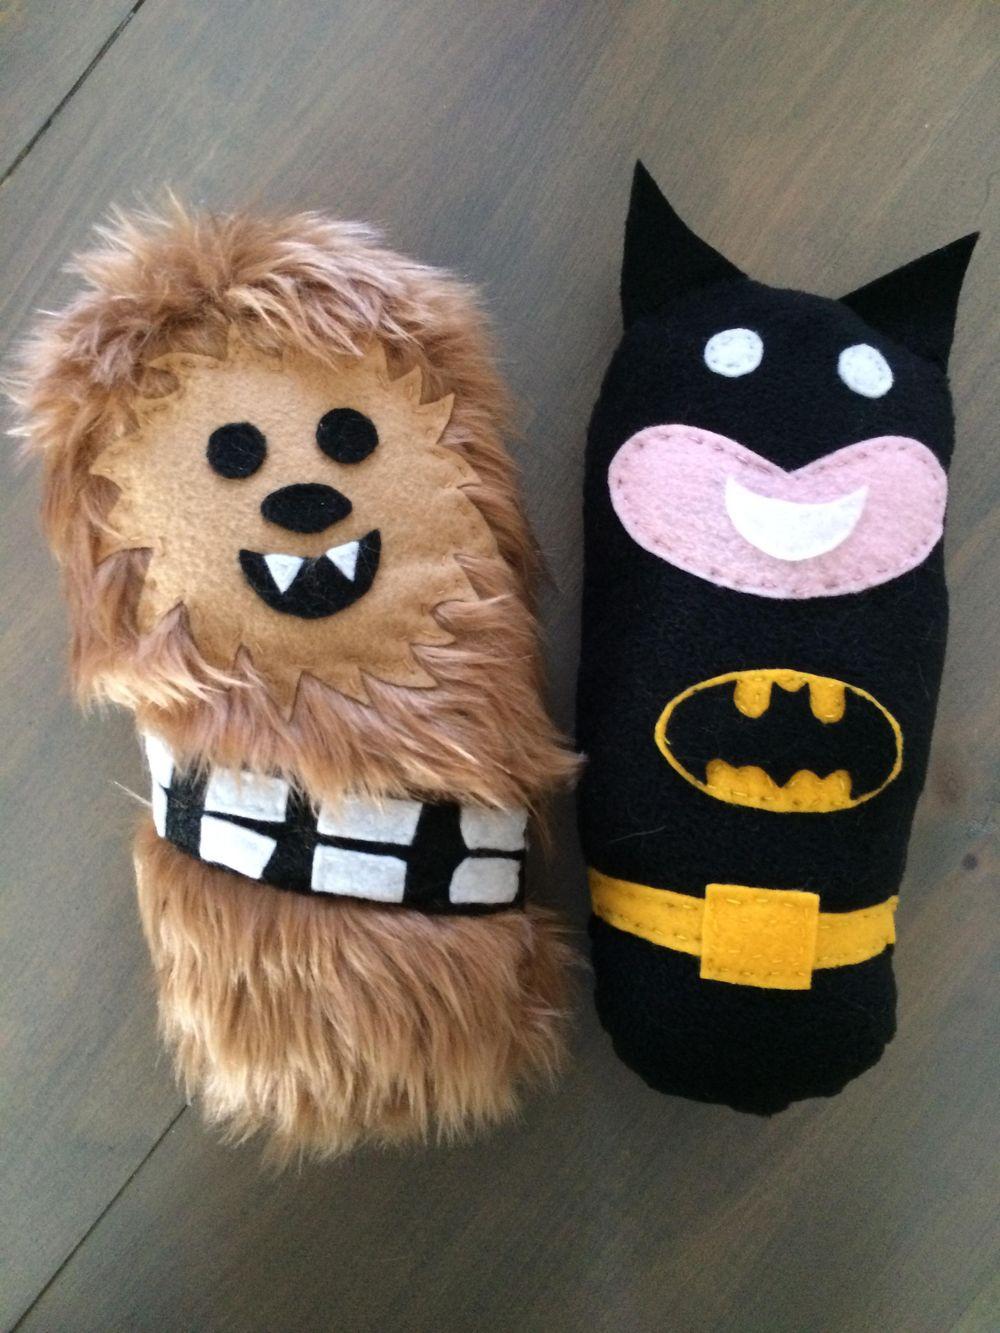 Chewbacca Batman - image 4 - student project